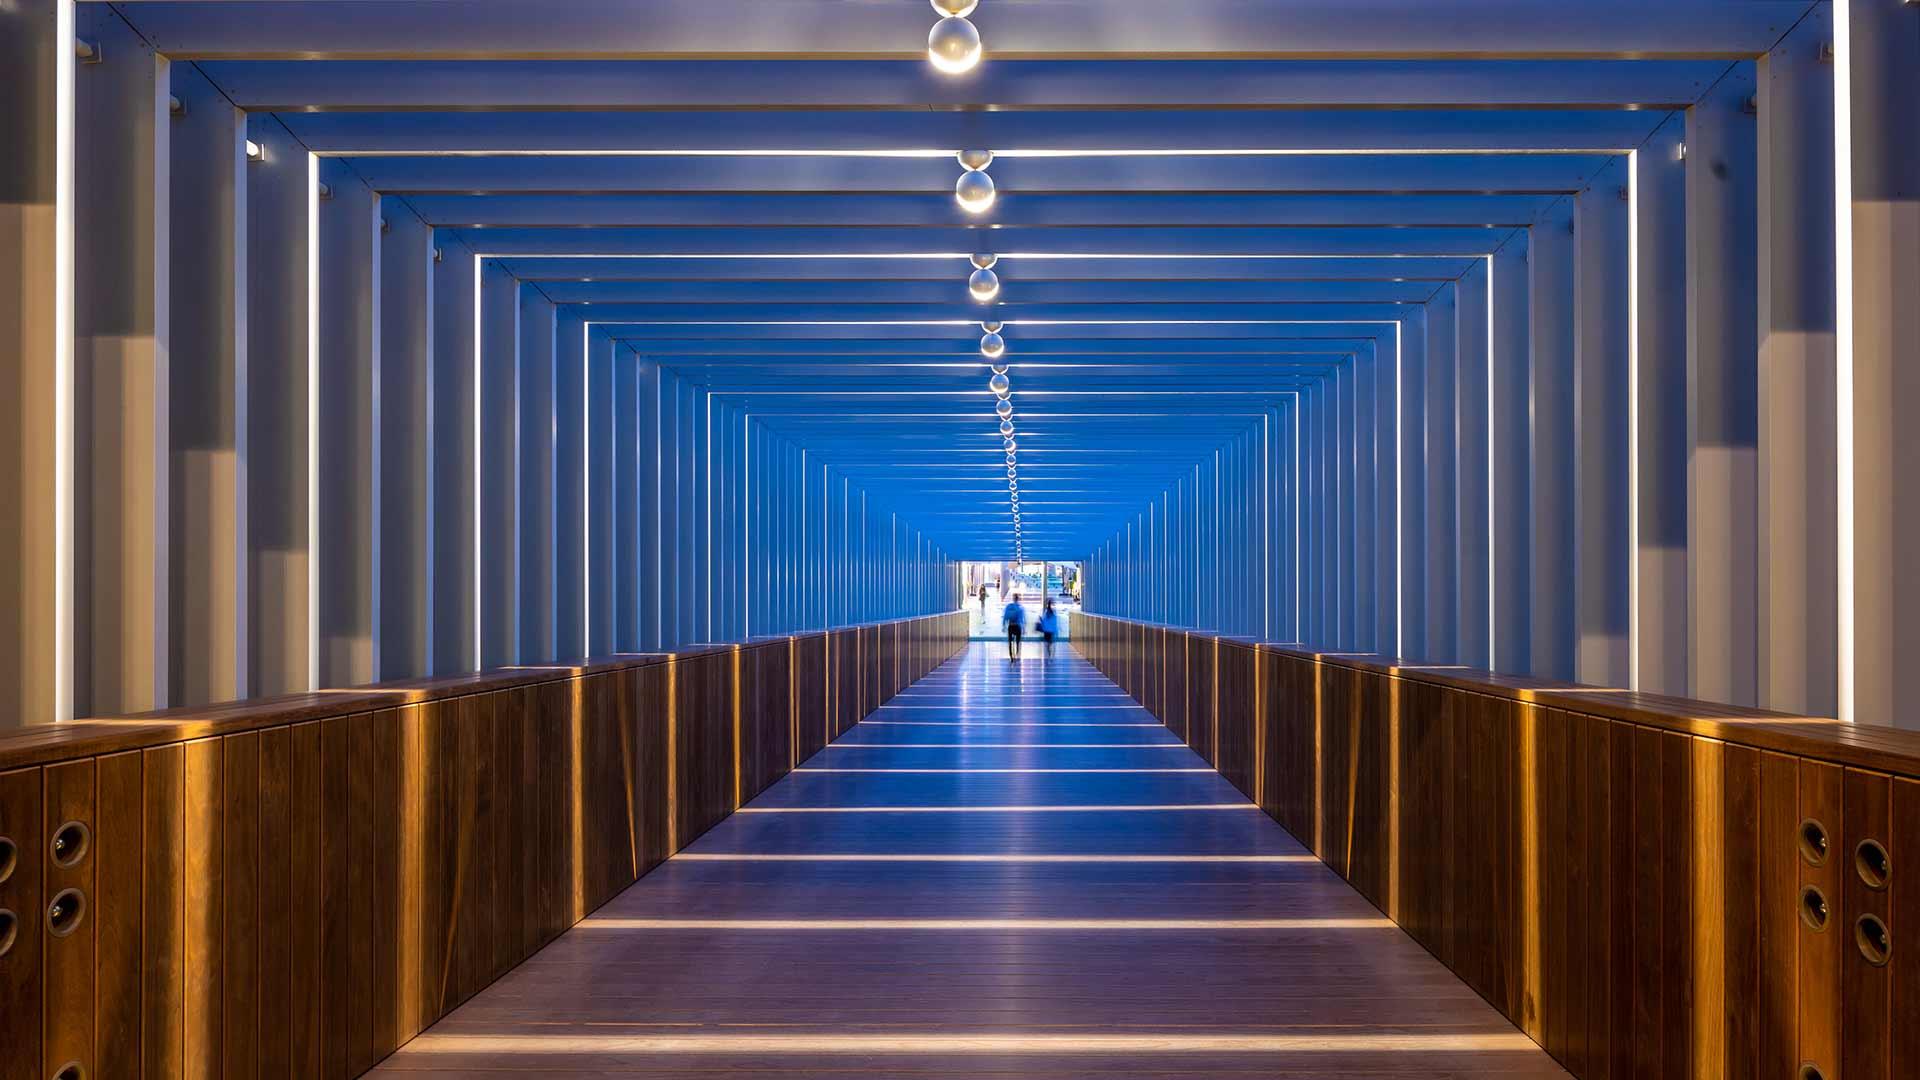 Lighting Design Interior Bridge Walkway 360 Degree Repetitive Bands Halos Portal Light Dubai Nulty